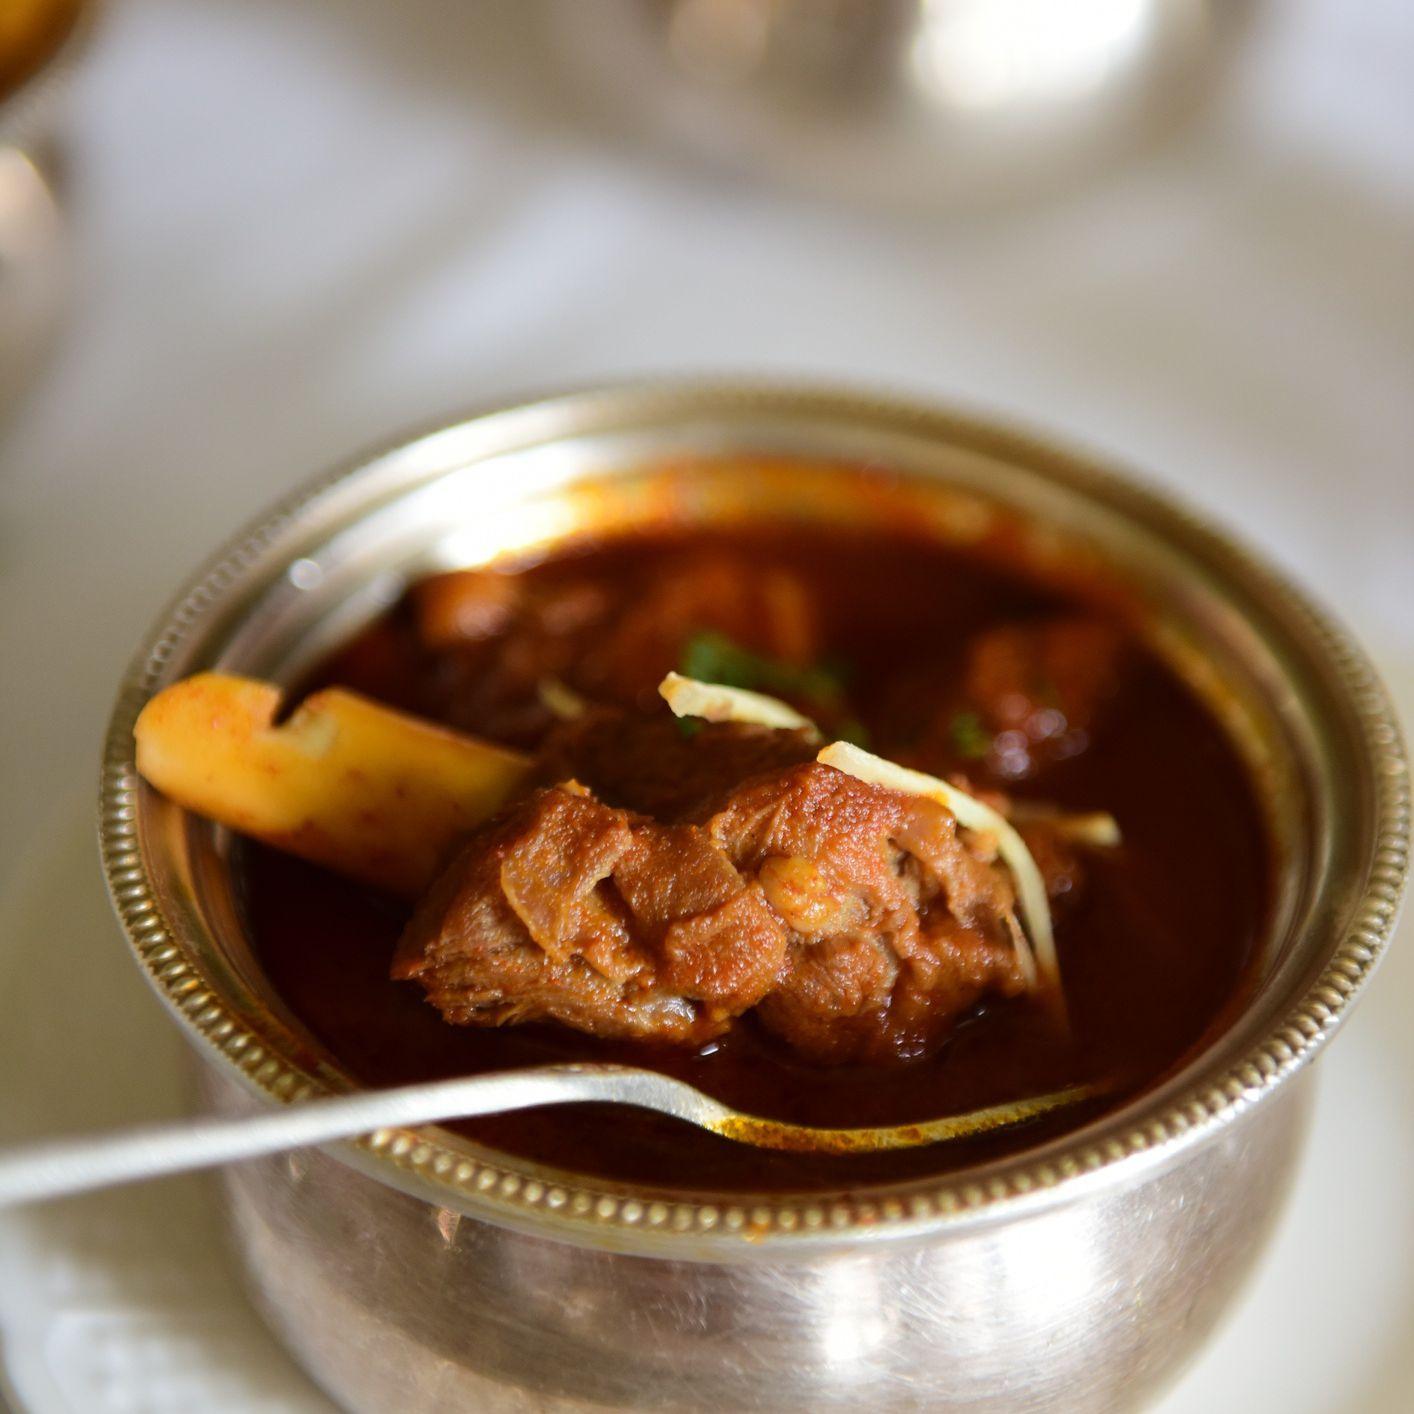 mutton stew in a metal bowl